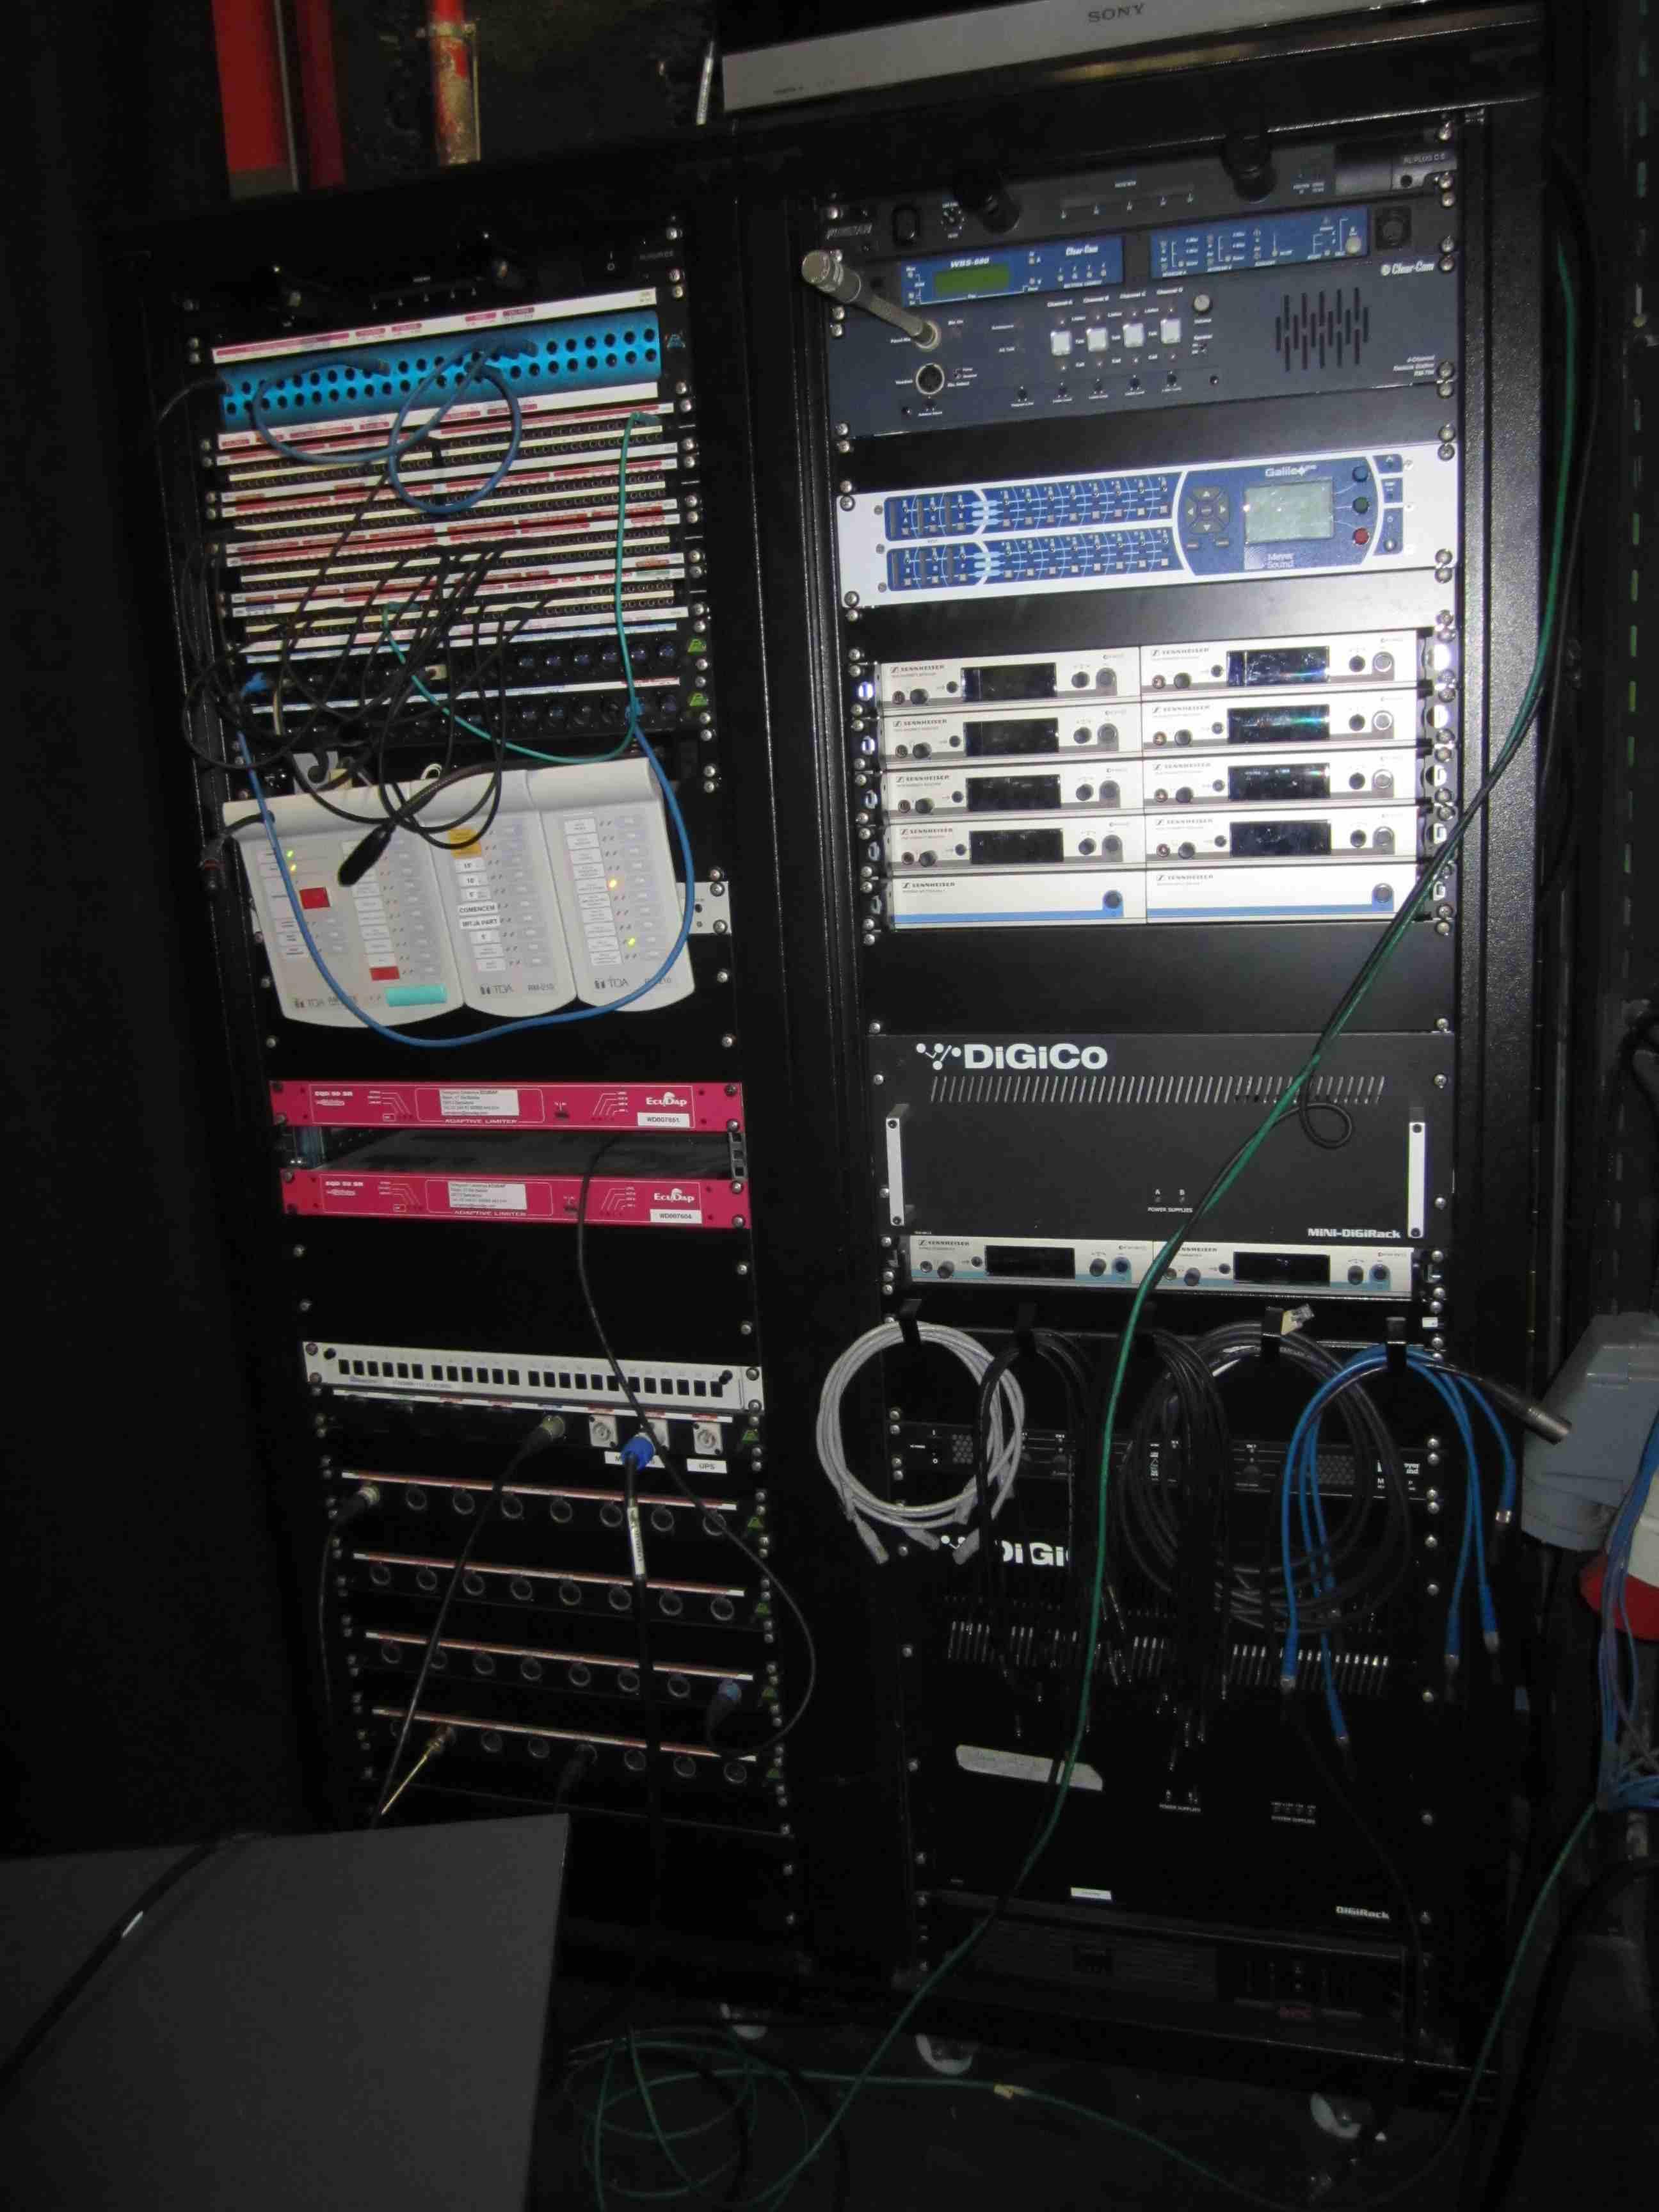 009 Esceanario Rack.JPG